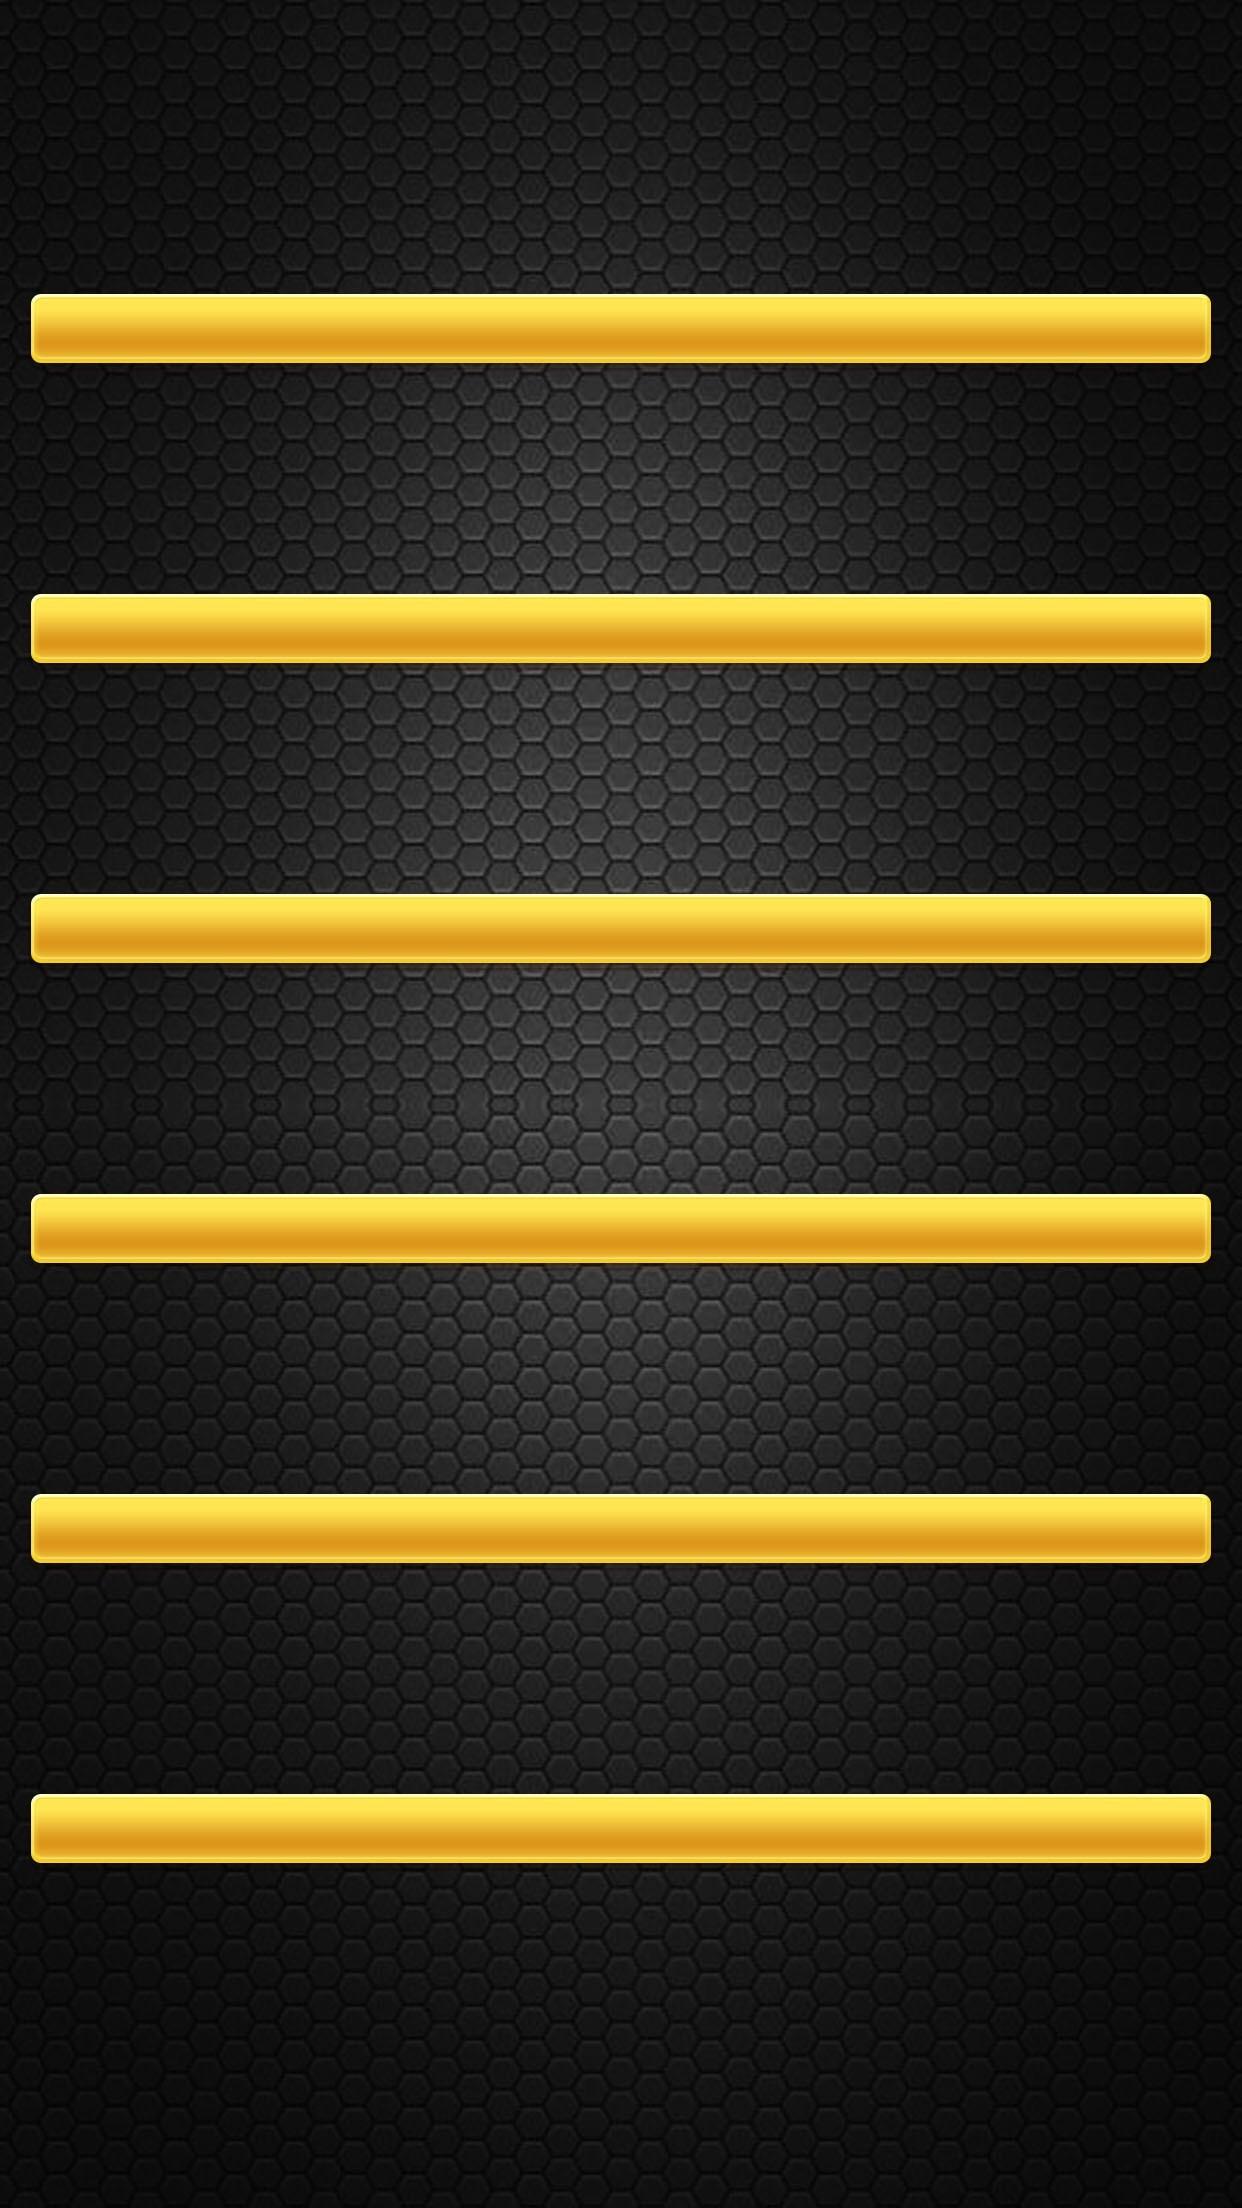 1242x2208 Phone Wallpapers Iphone 6 Screens Shelves